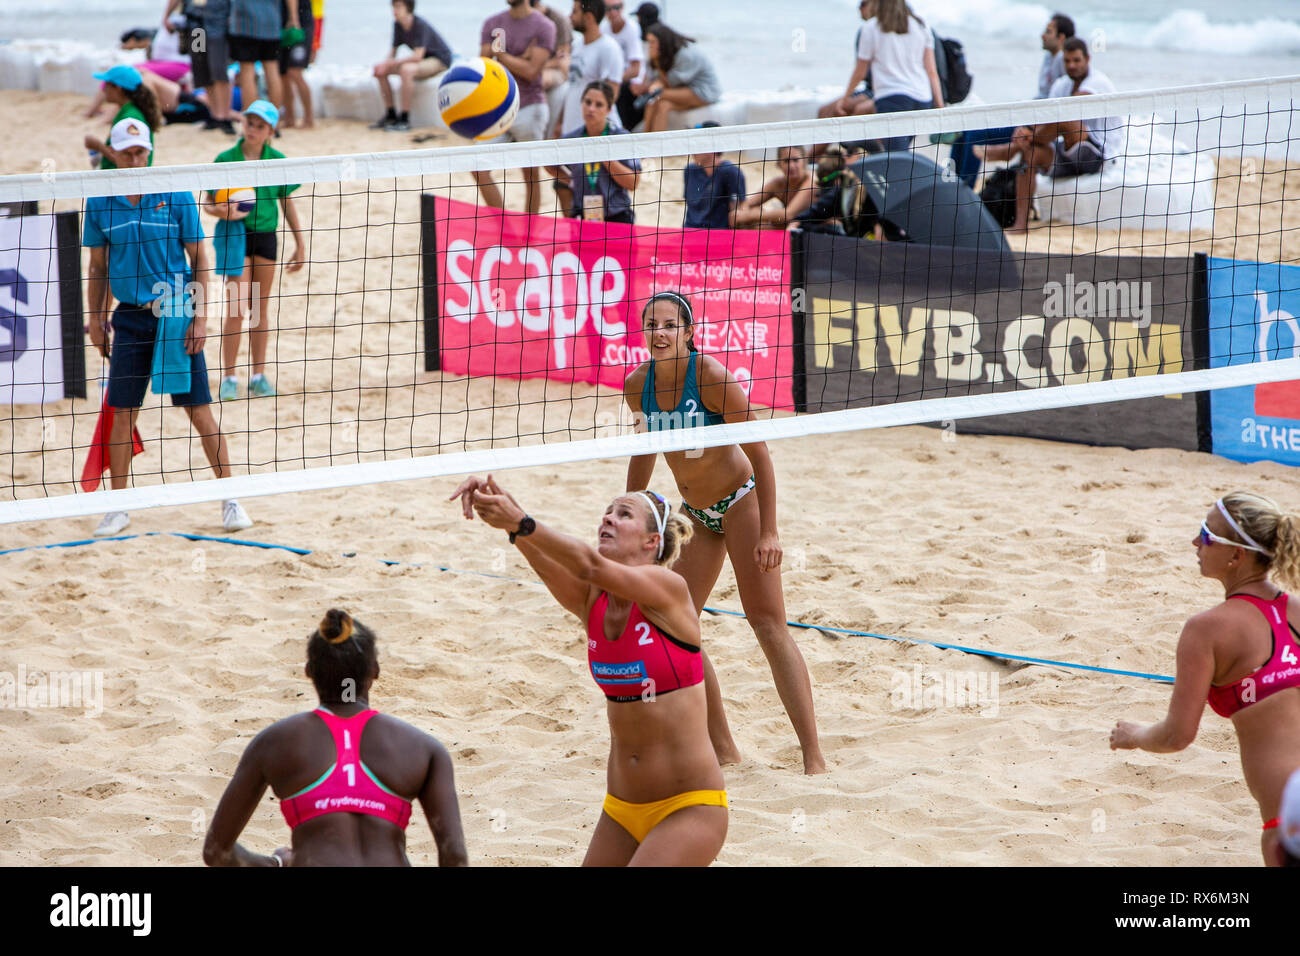 Sydney Australia 9th Mar 2019 Quarter Finals Day At Volleyfest 2019 A Fivb Beach Volleyball World